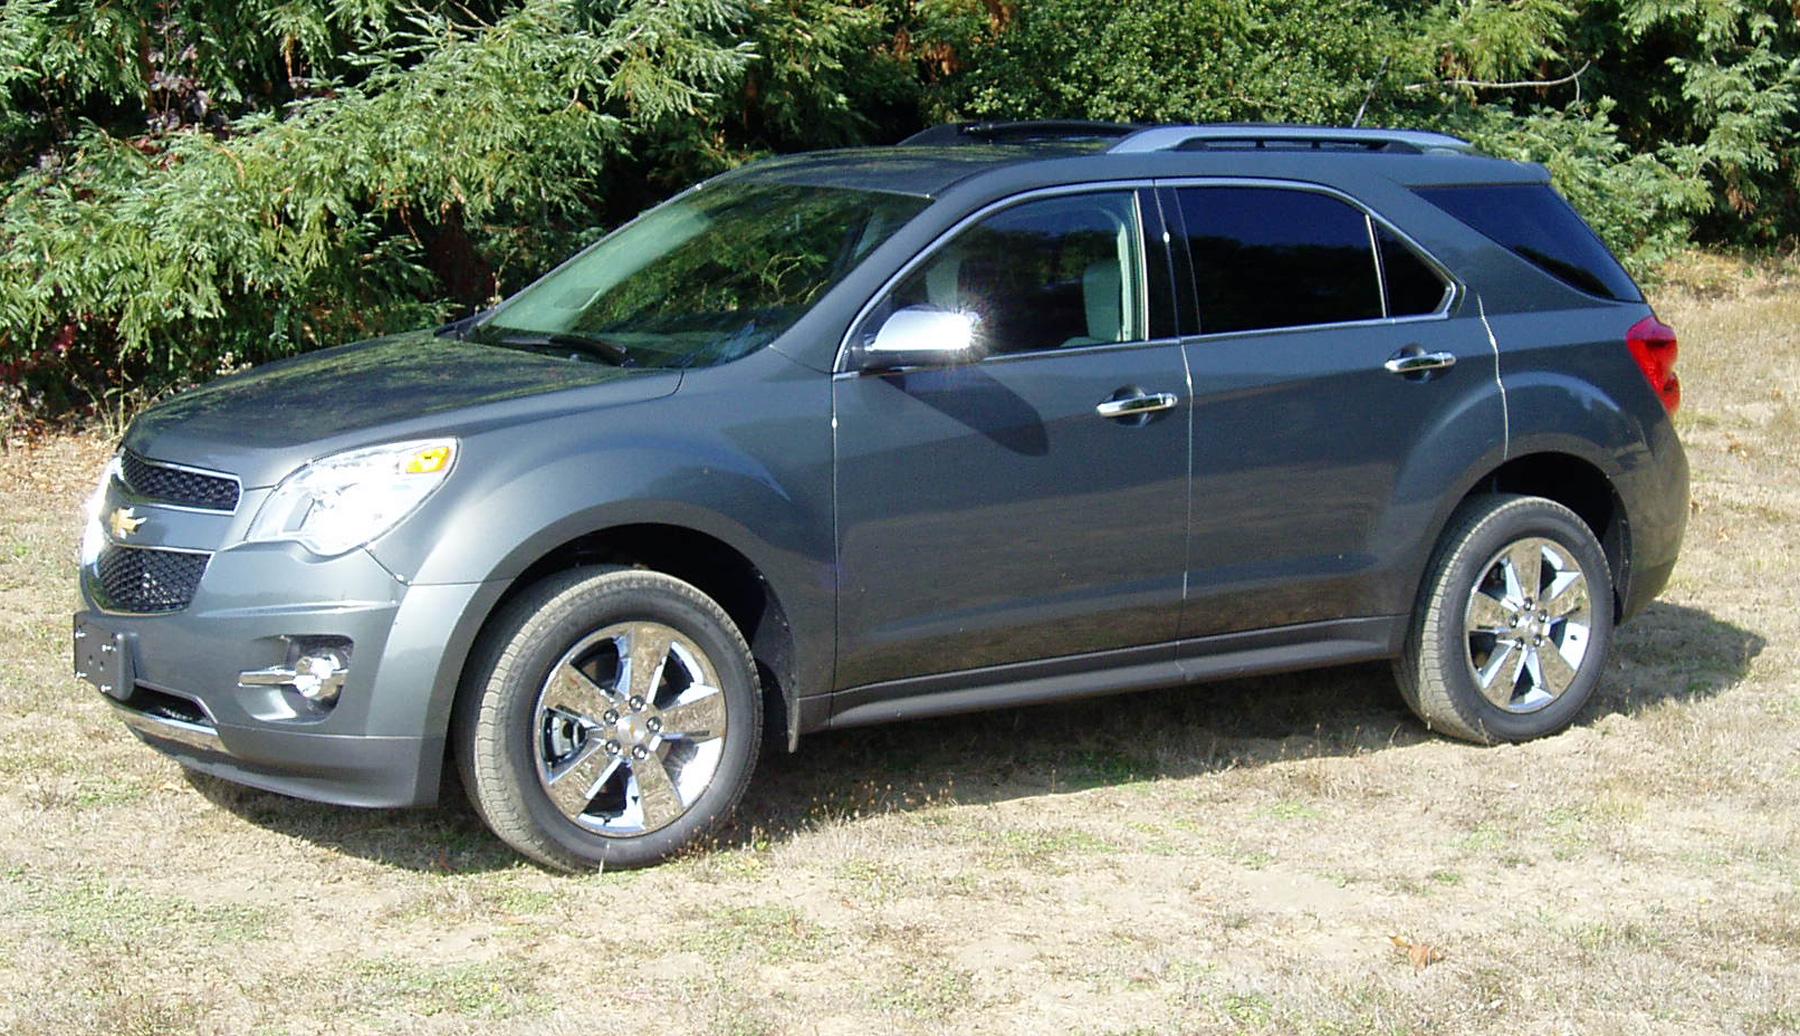 Equinox 2013 chevy equinox : Test Drive: 2013 Chevrolet Equinox AWD LTZ – Our Auto Expert